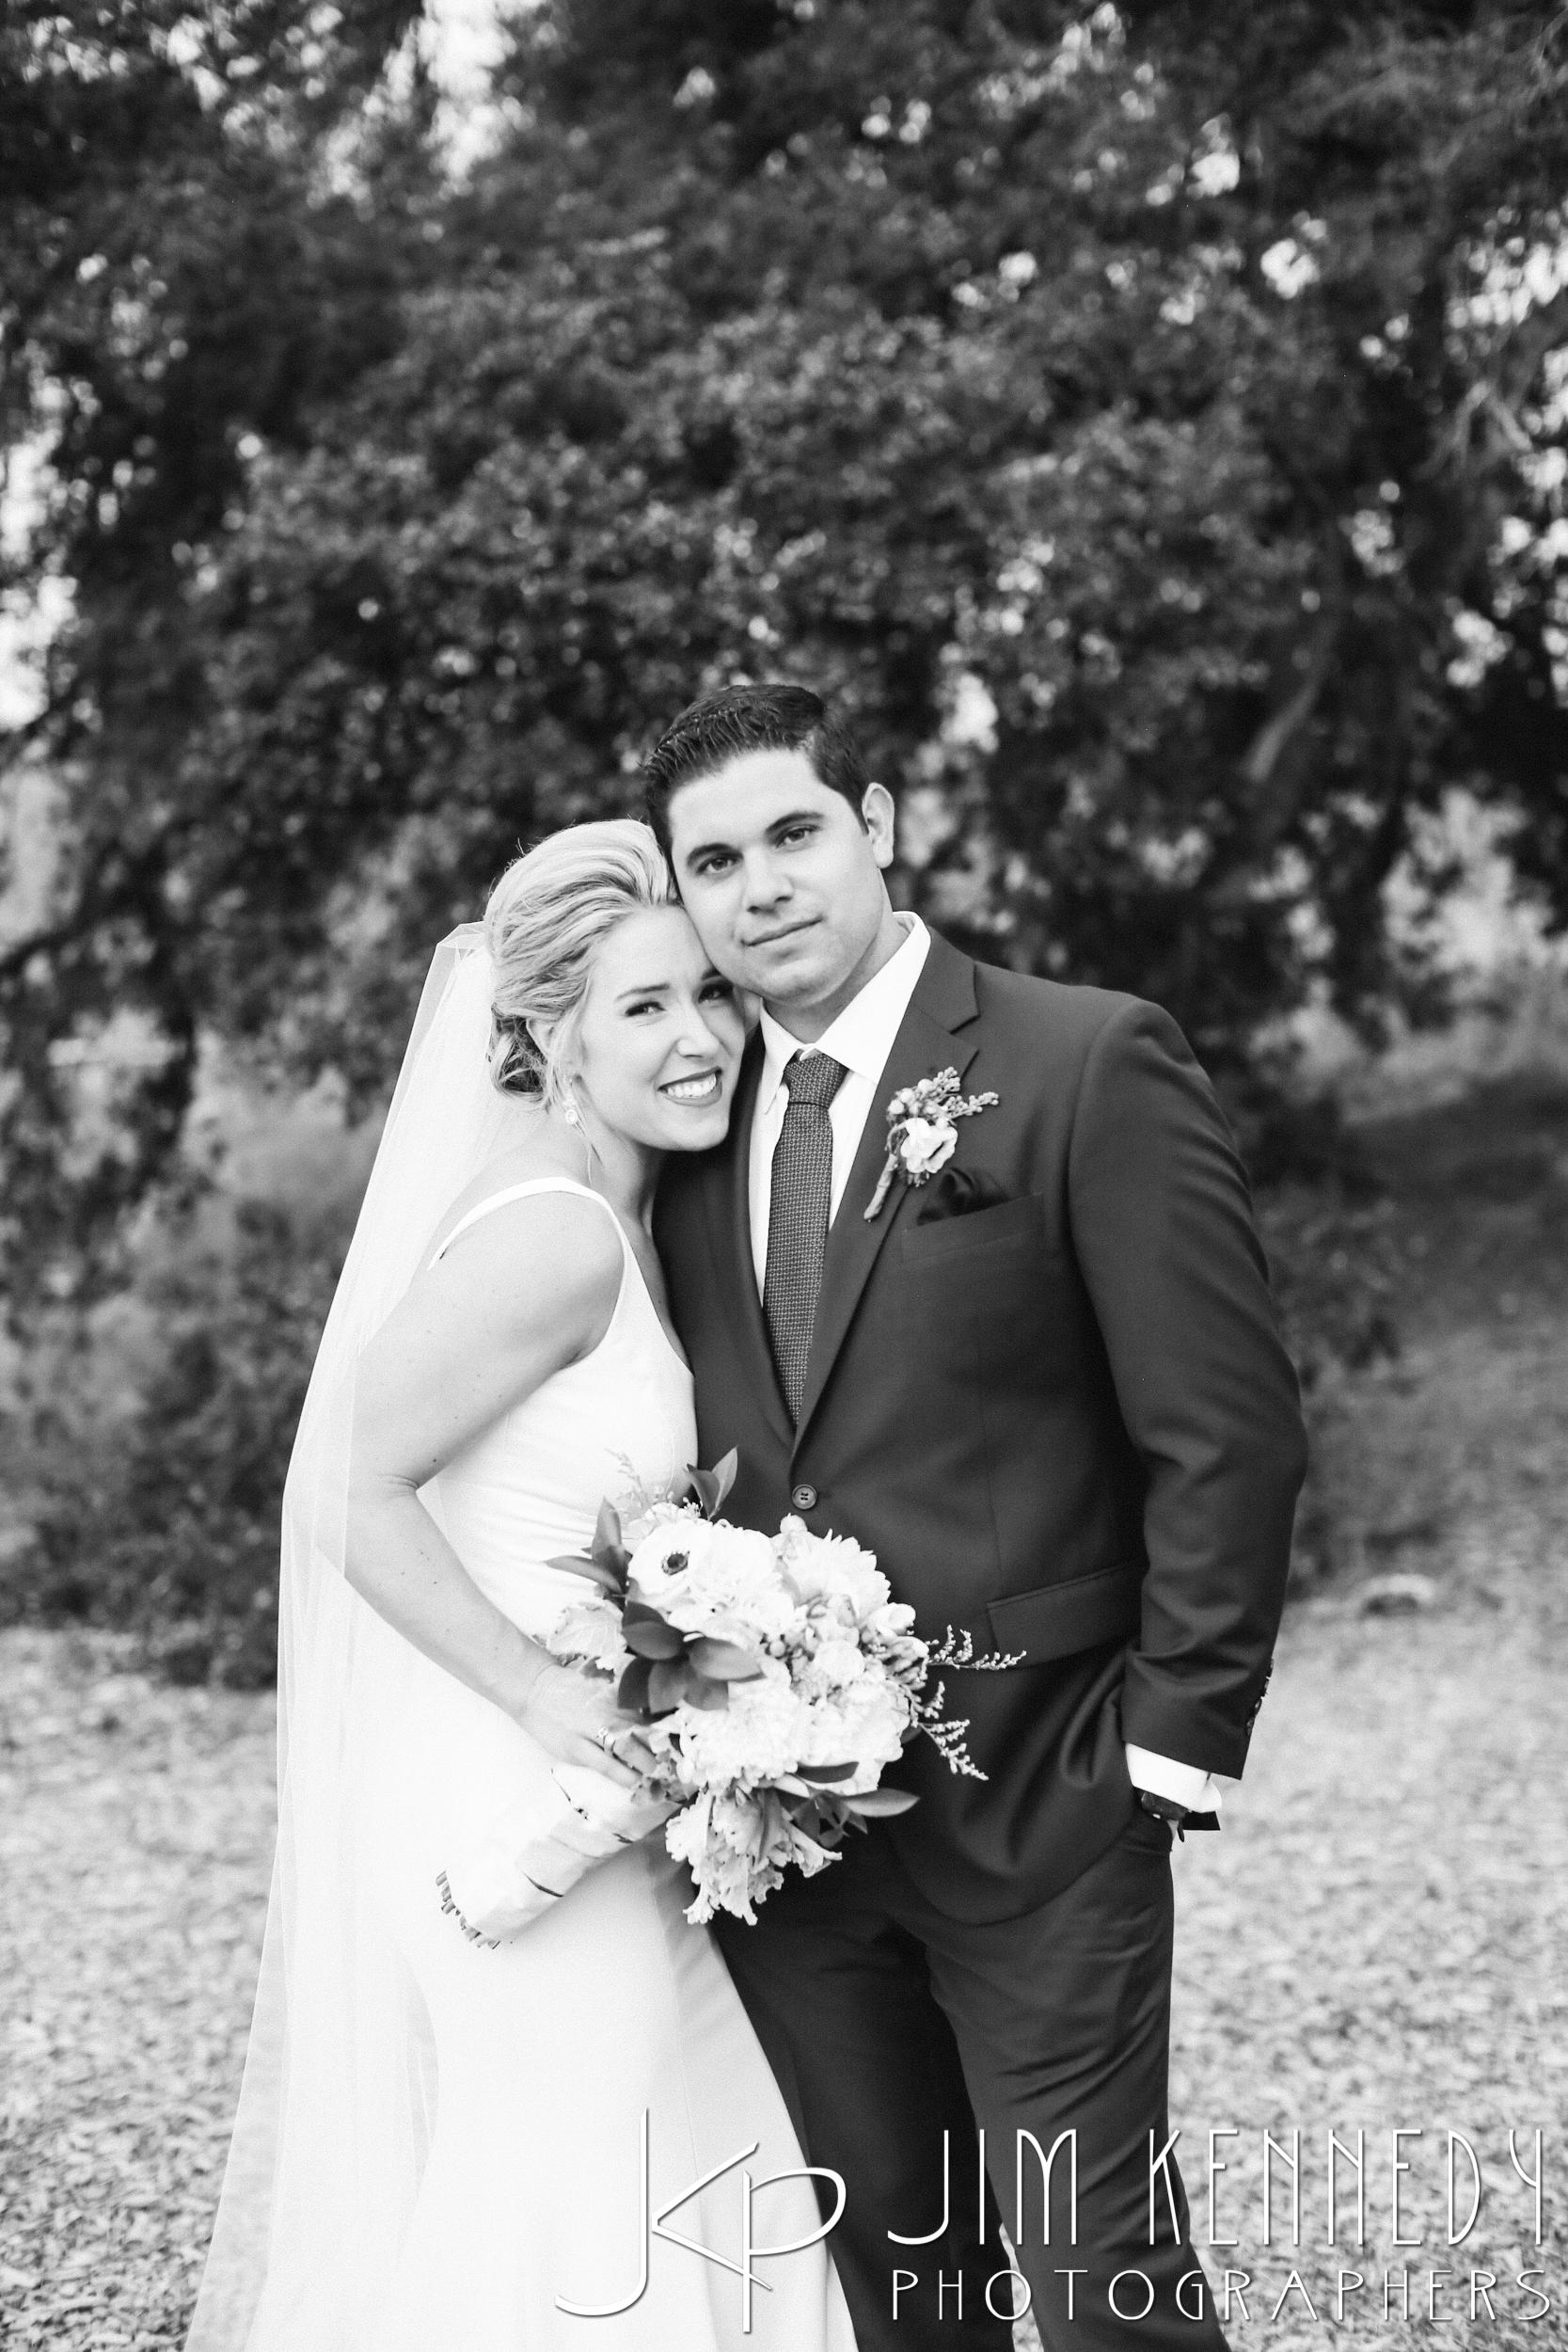 jim_kennedy_photographers_highland_springs_wedding_caitlyn_0147.jpg